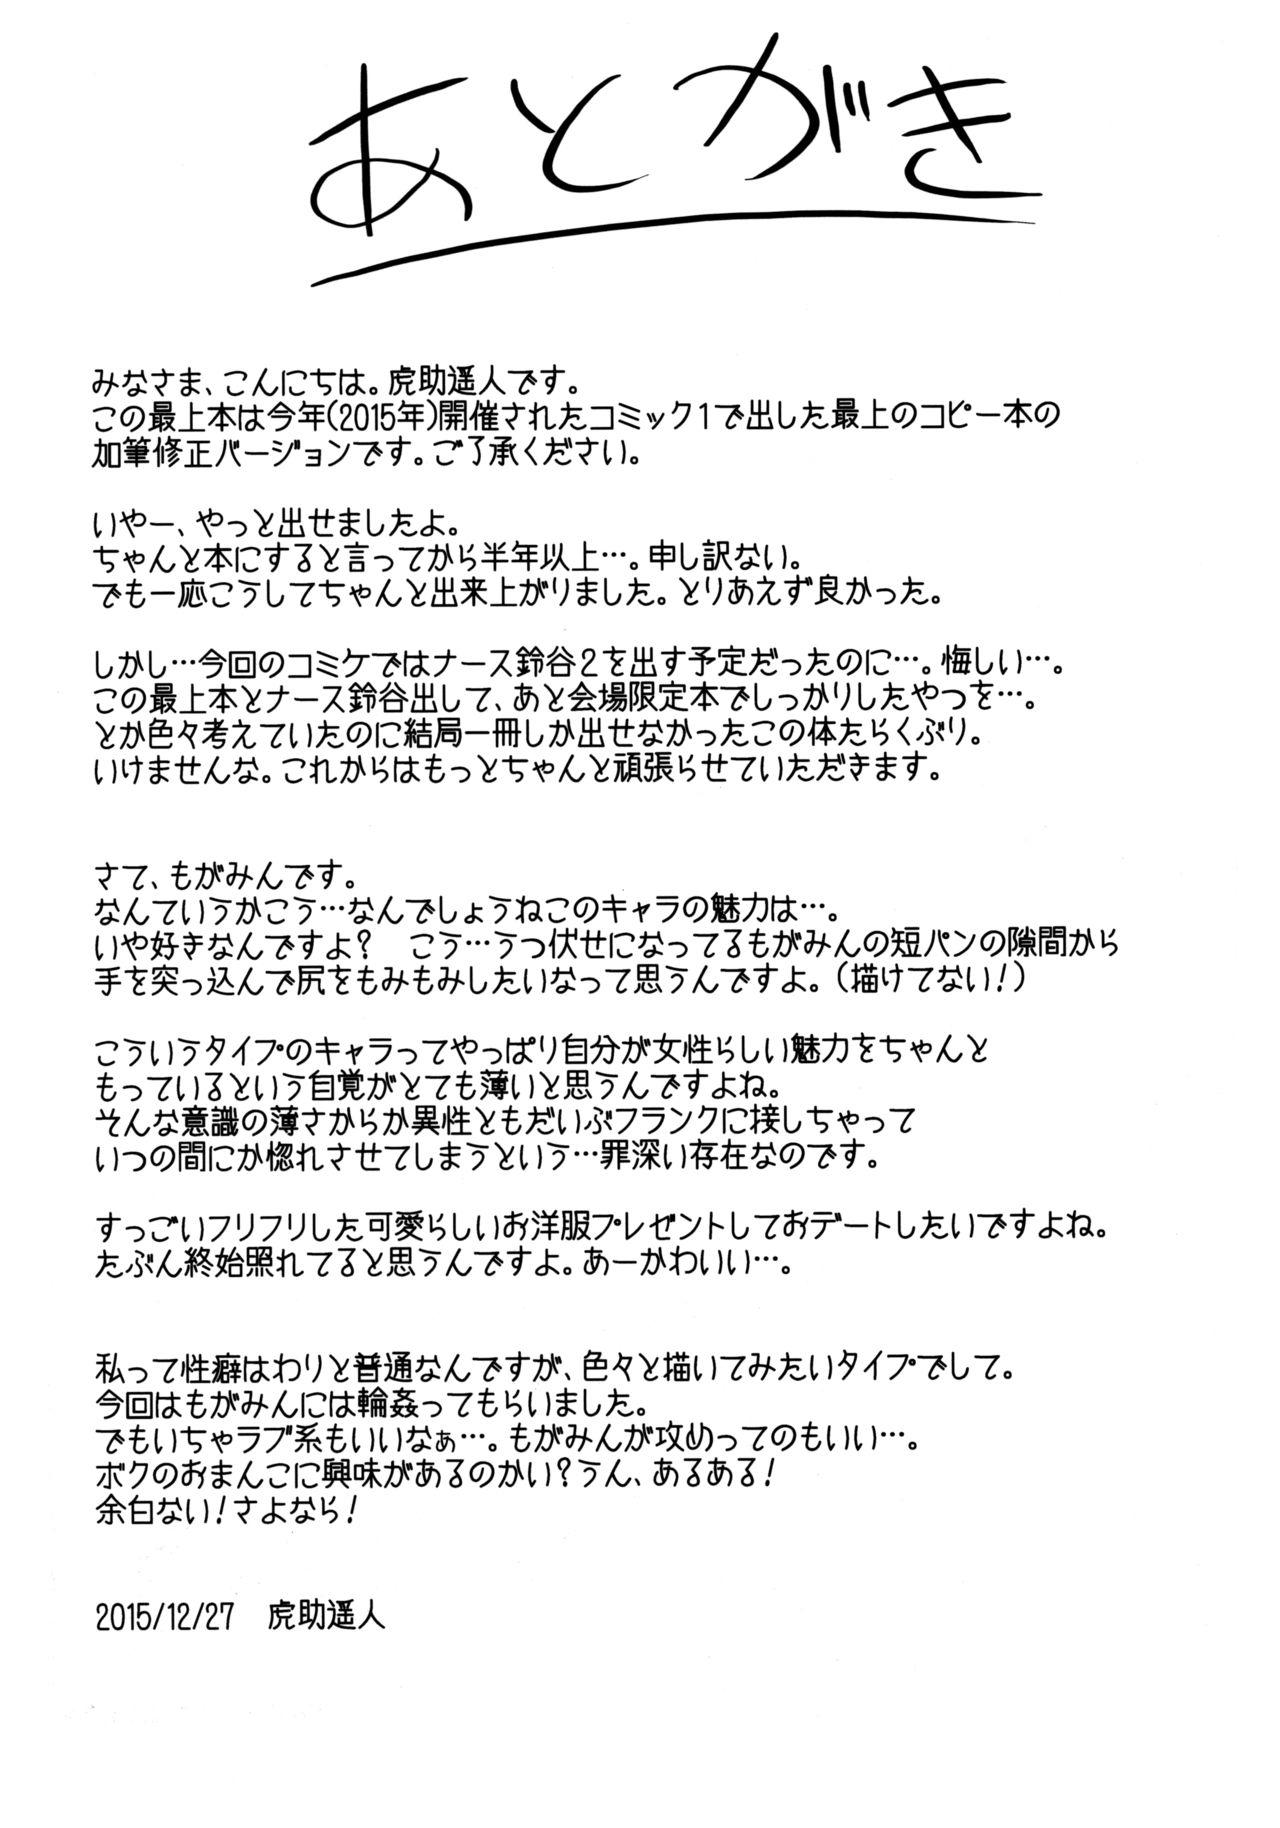 Juujunyoukan Mogami 20